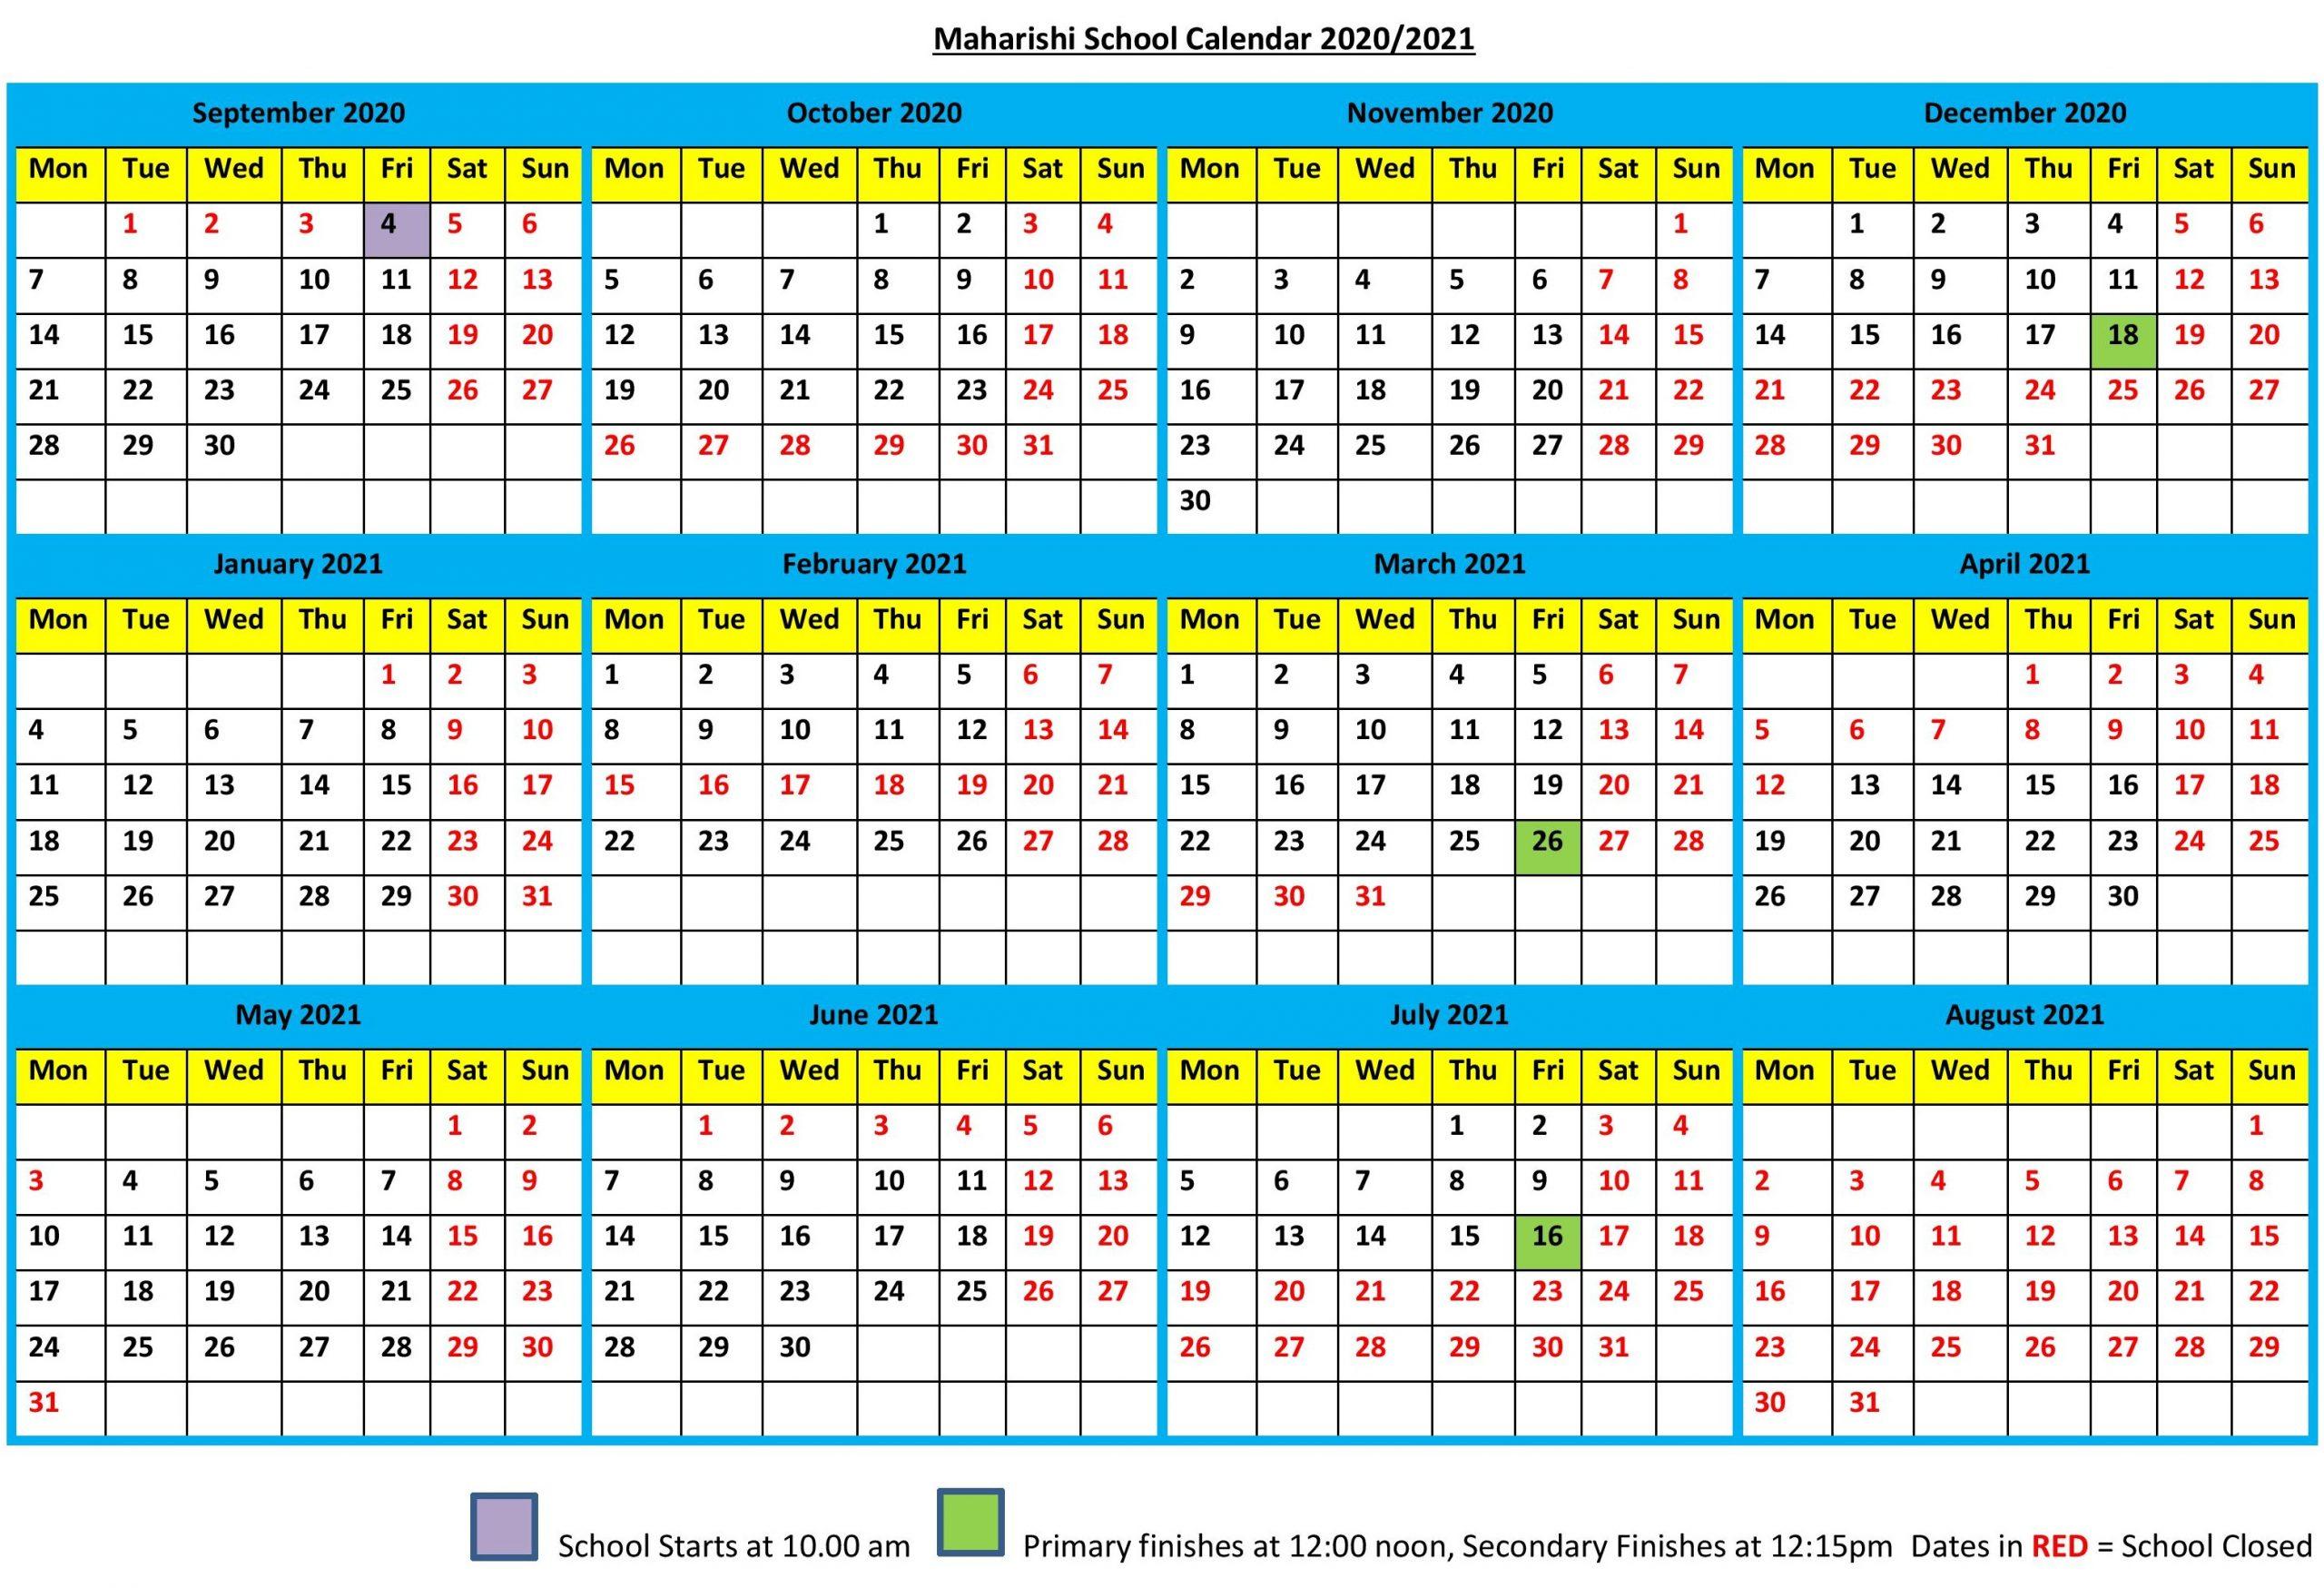 School Calendar 2020-2021 - Maharishi School